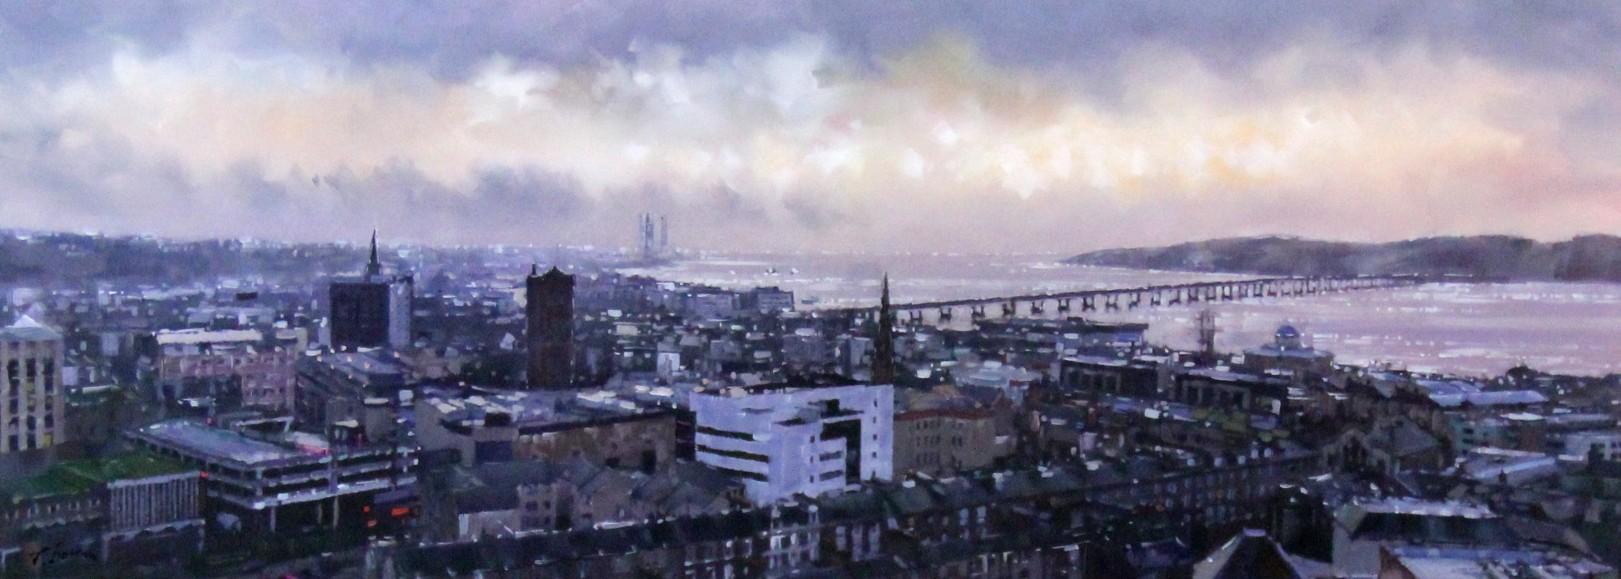 Joe Bowen_Rooftops, Dundee_Acrylic with resin varnish_15x40_950